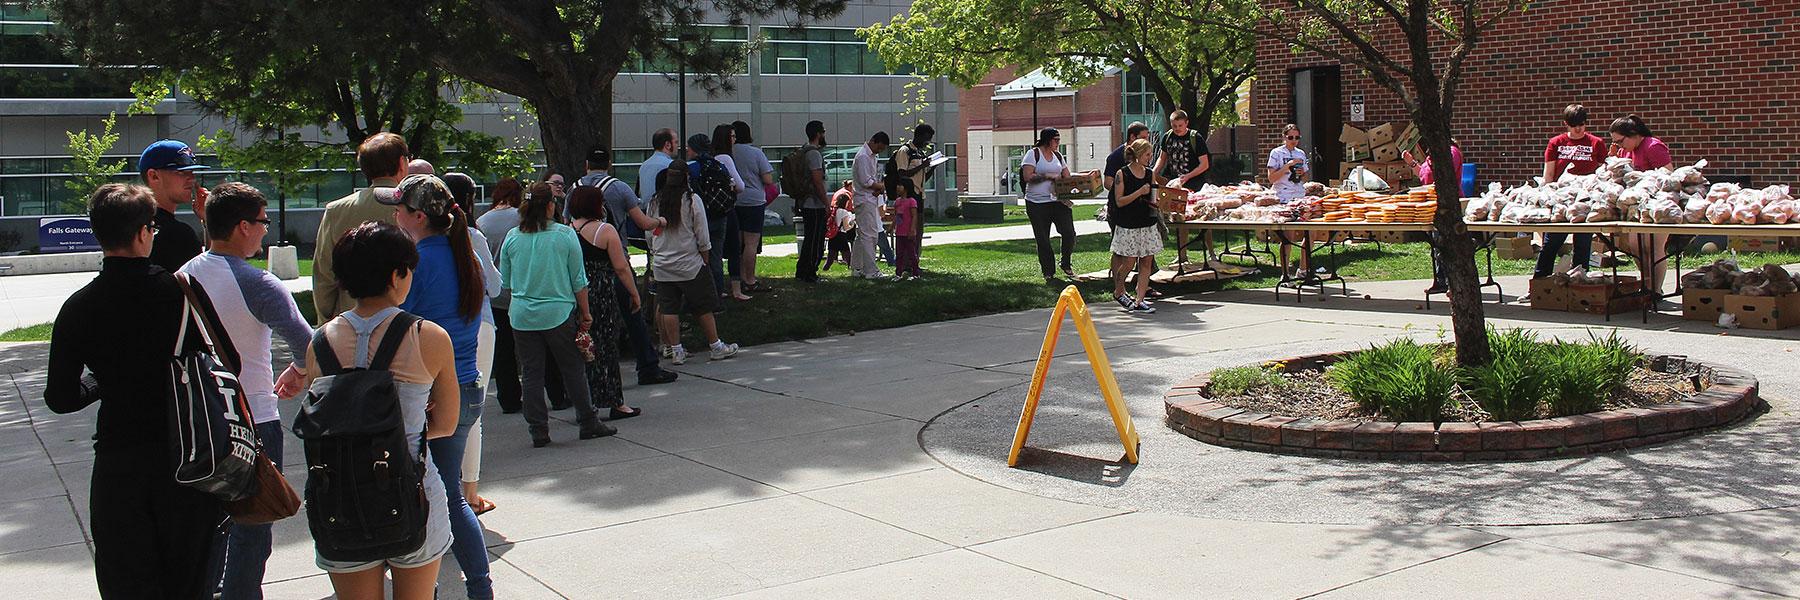 Student Resources Regarding Spokane Falls Commmunity College Acedemic Calender